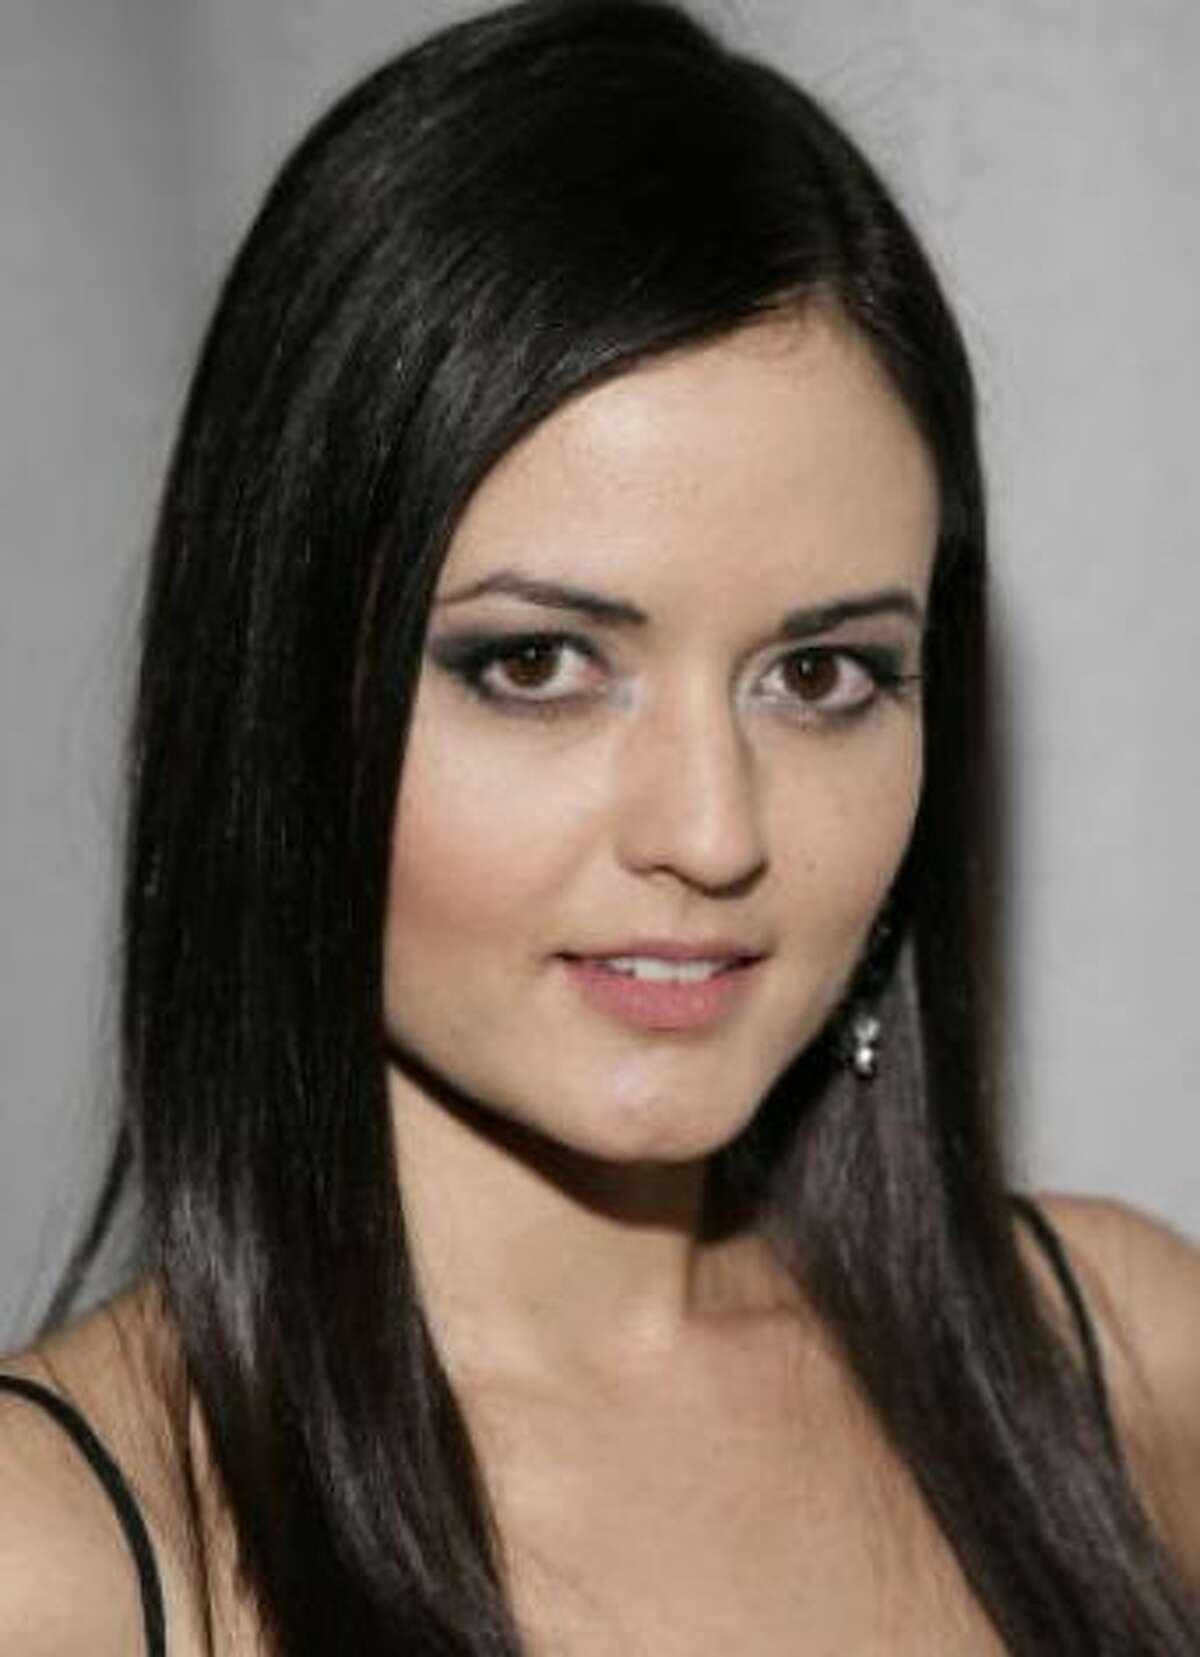 Danica McKellar Jan. 3